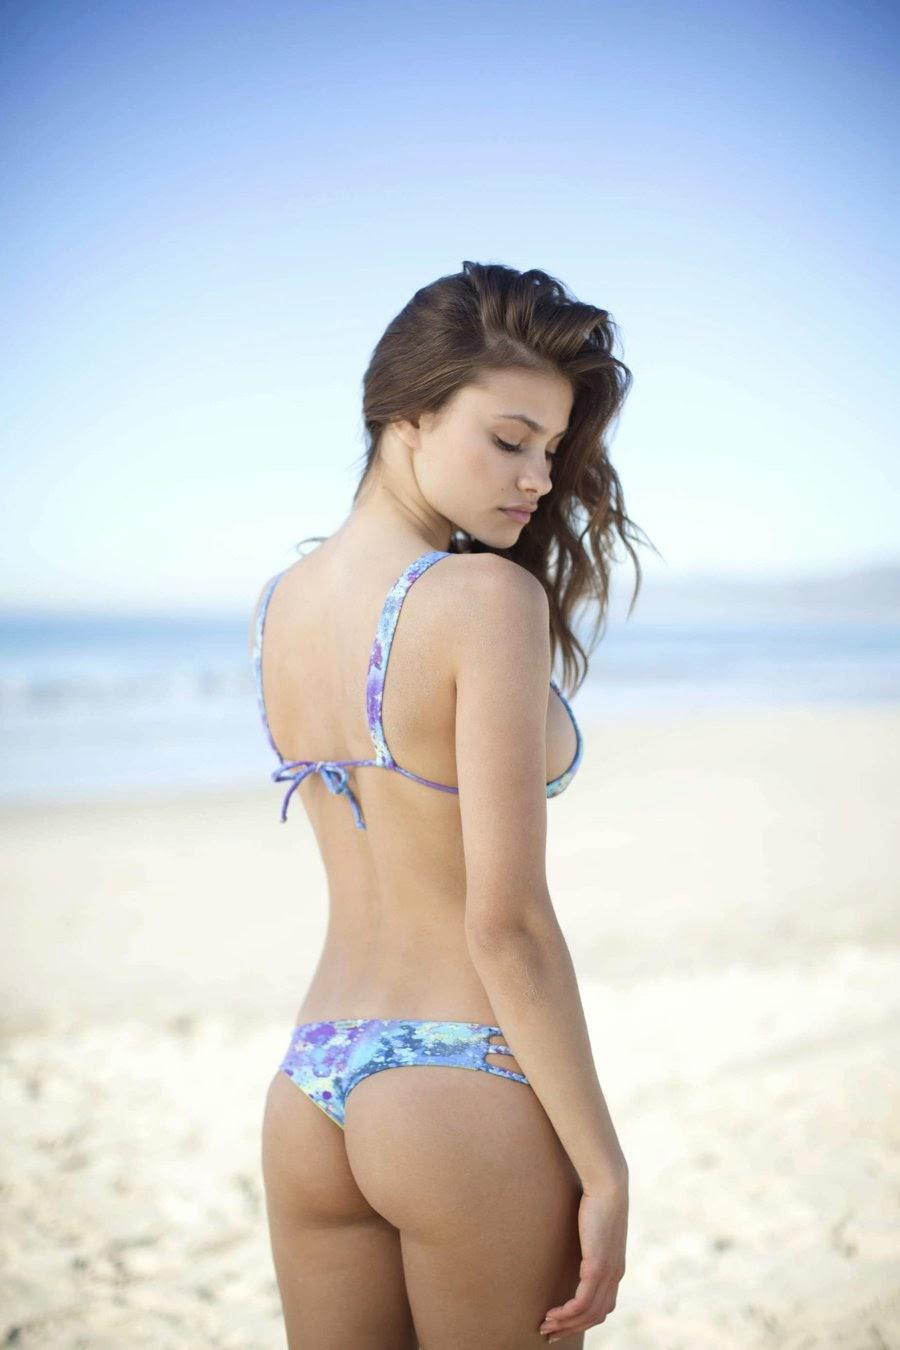 Yara Khmidan sexy bikini pics